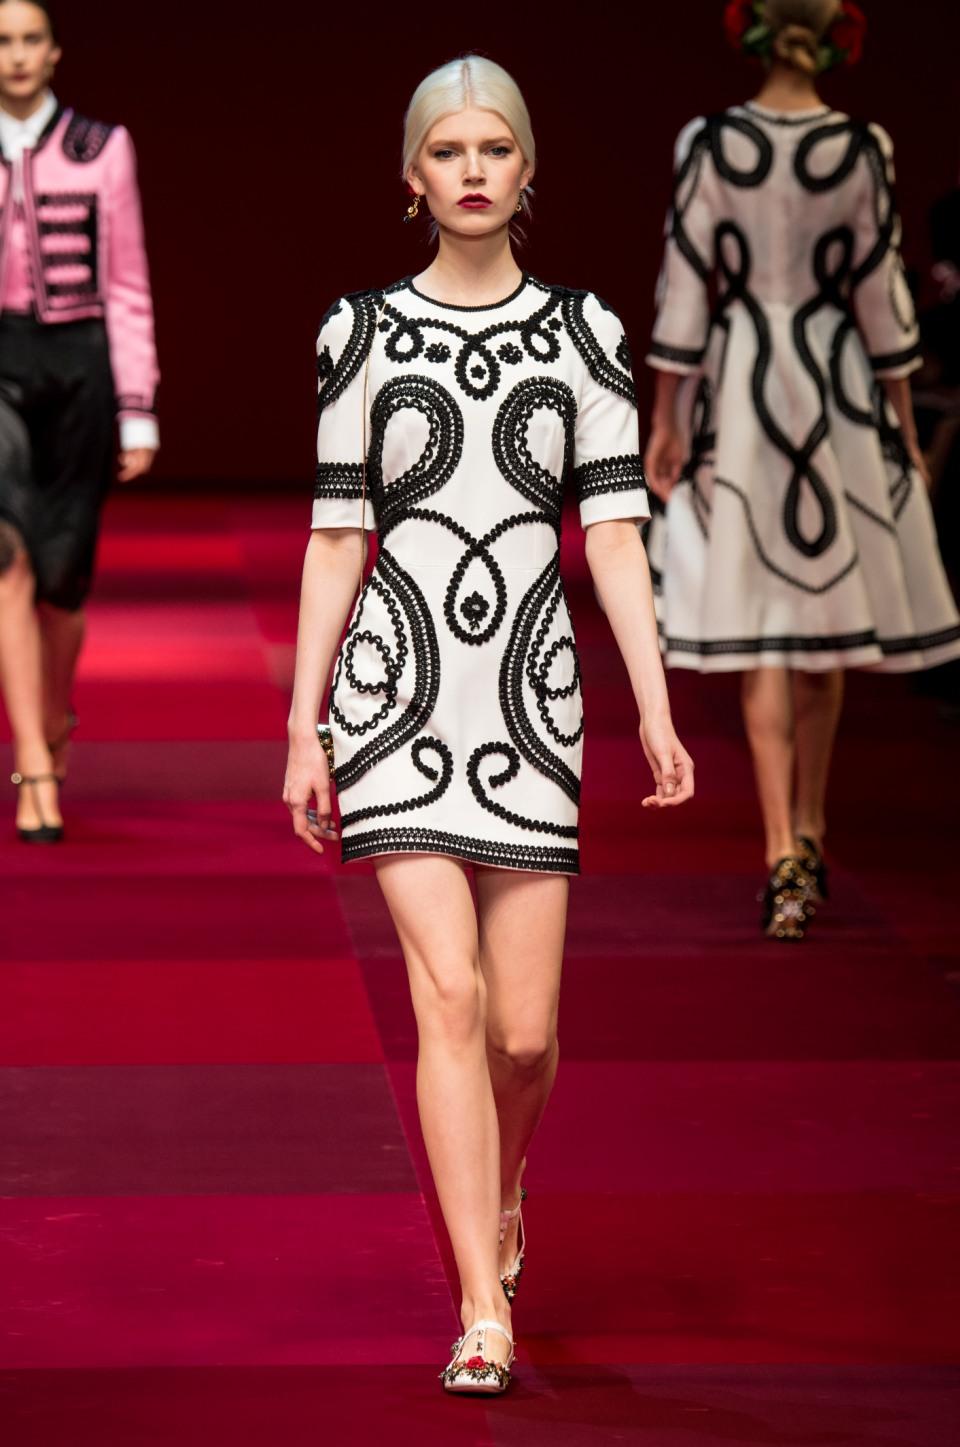 f9a03fecb36d 5 ασπρόμαυρα φορέματα για κομψά office looks